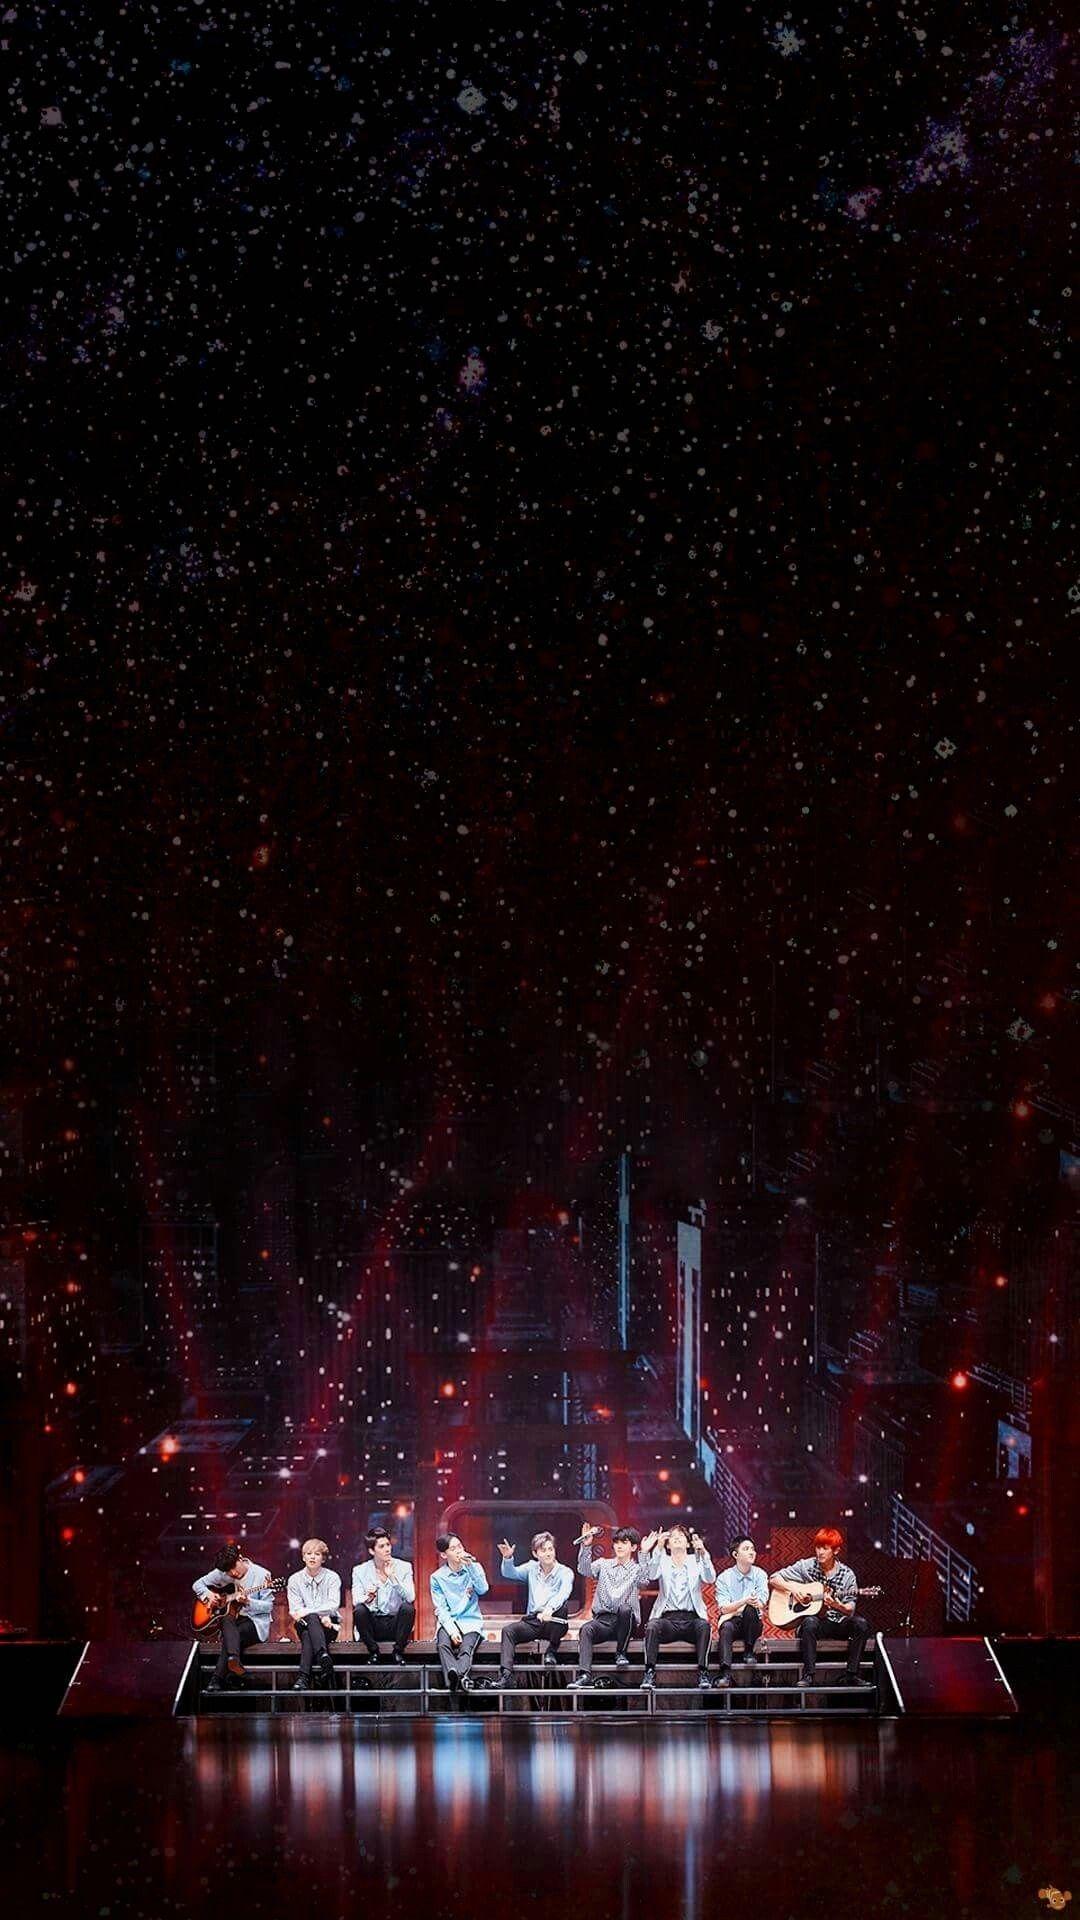 Res 1080x1920, Exo Wallpaper Hd iPhone New Exo Logo